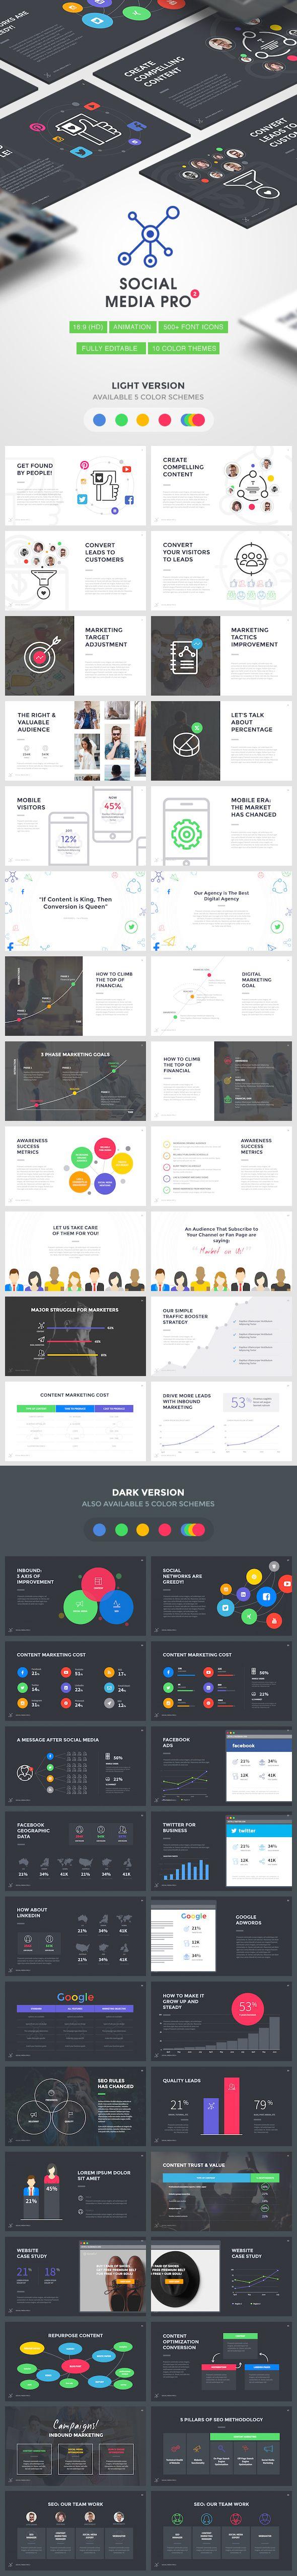 Social Media PRO 2 - Marketing Keynote Template | Keynote ...